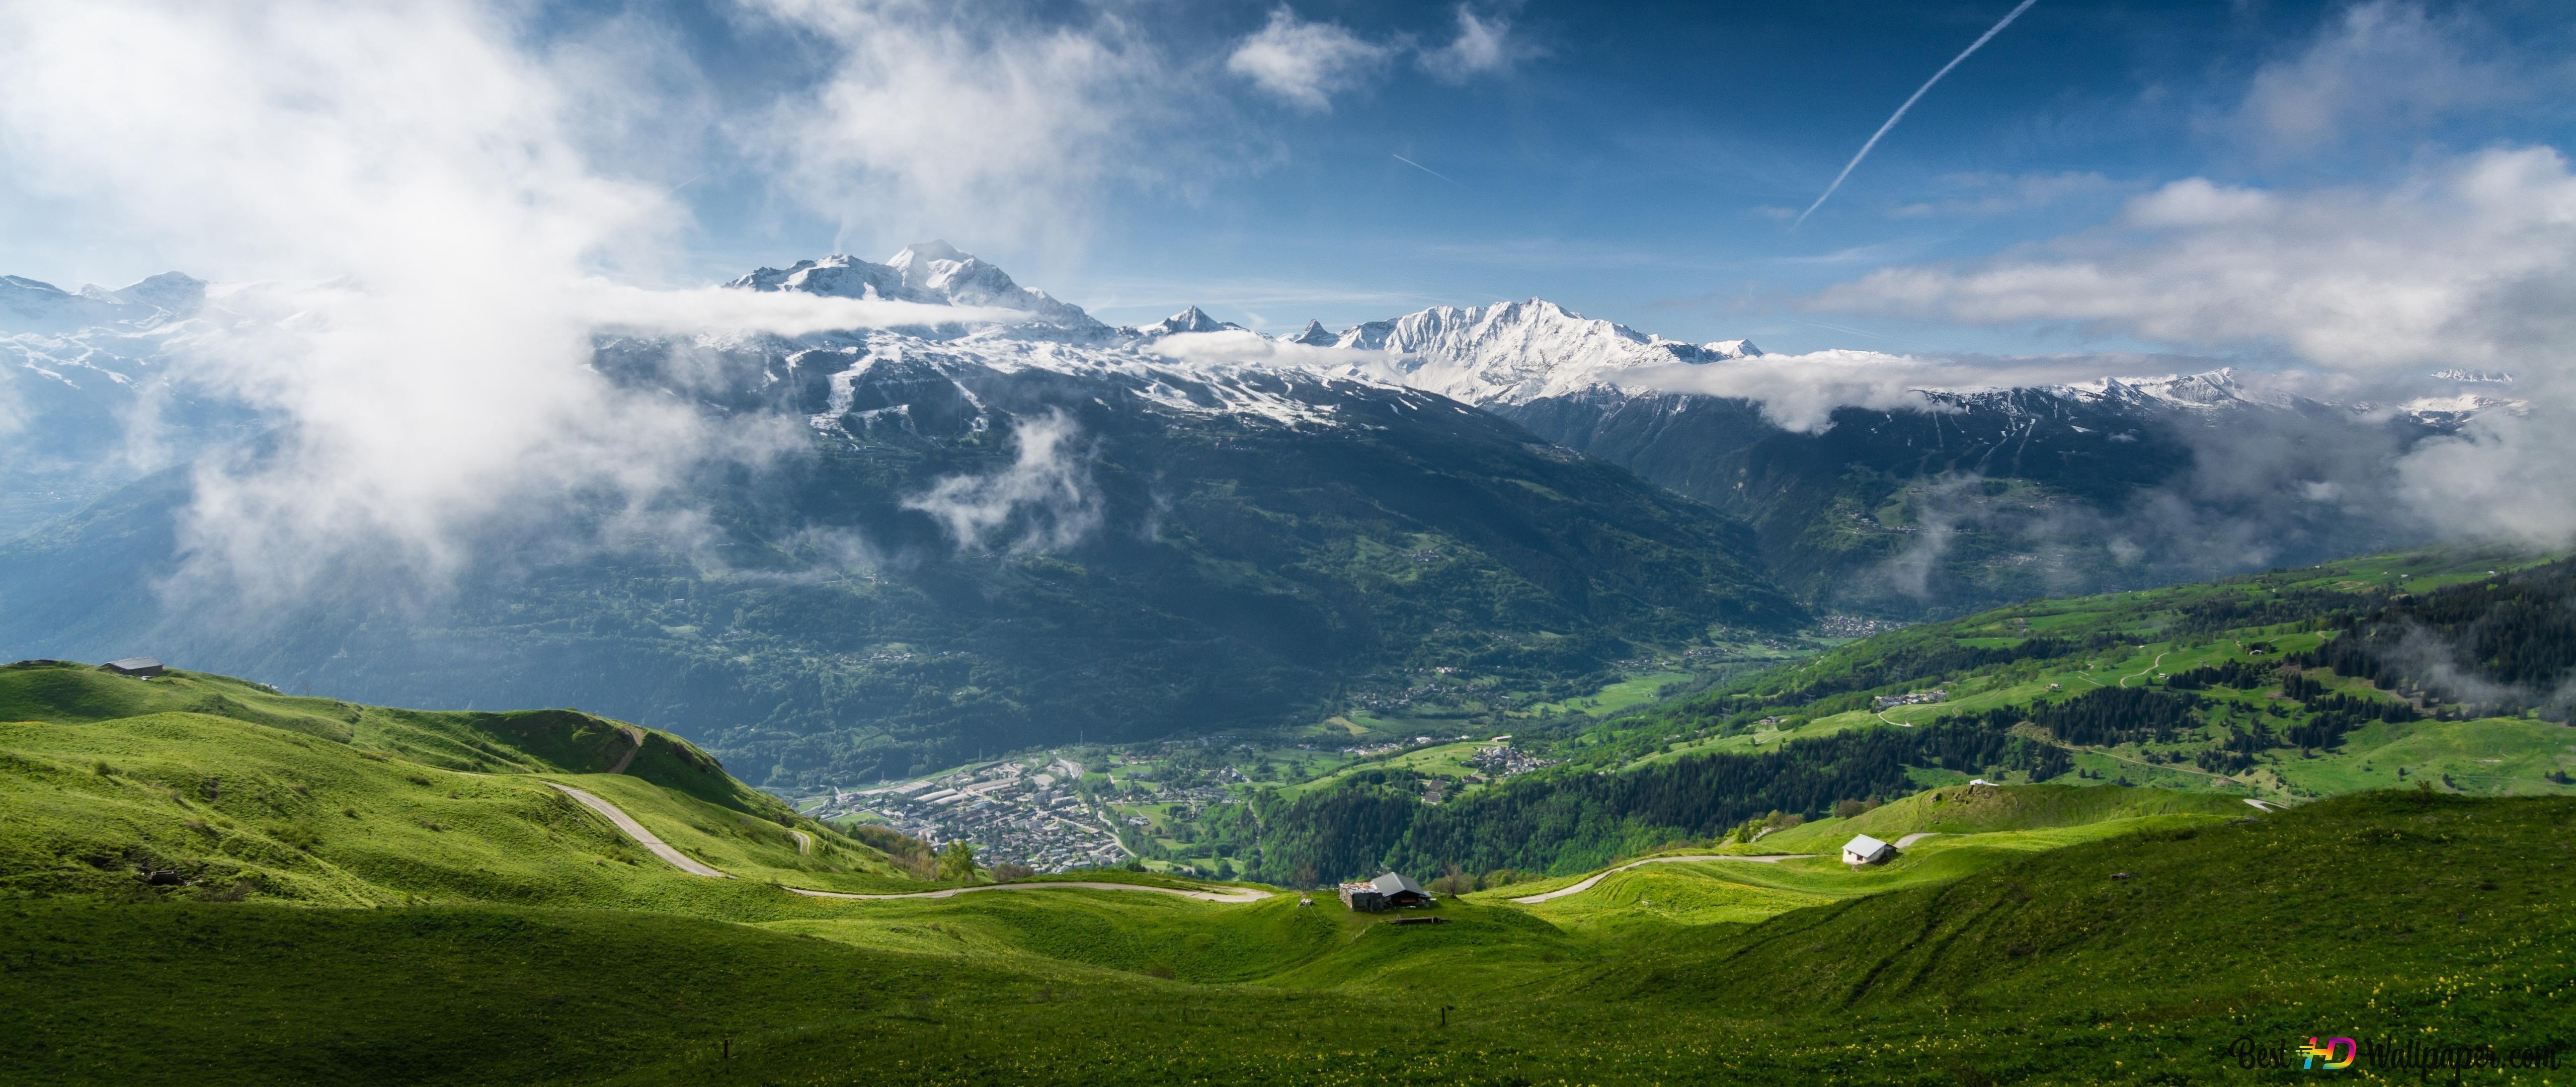 Neve In Montagna Download Di Sfondi Hd